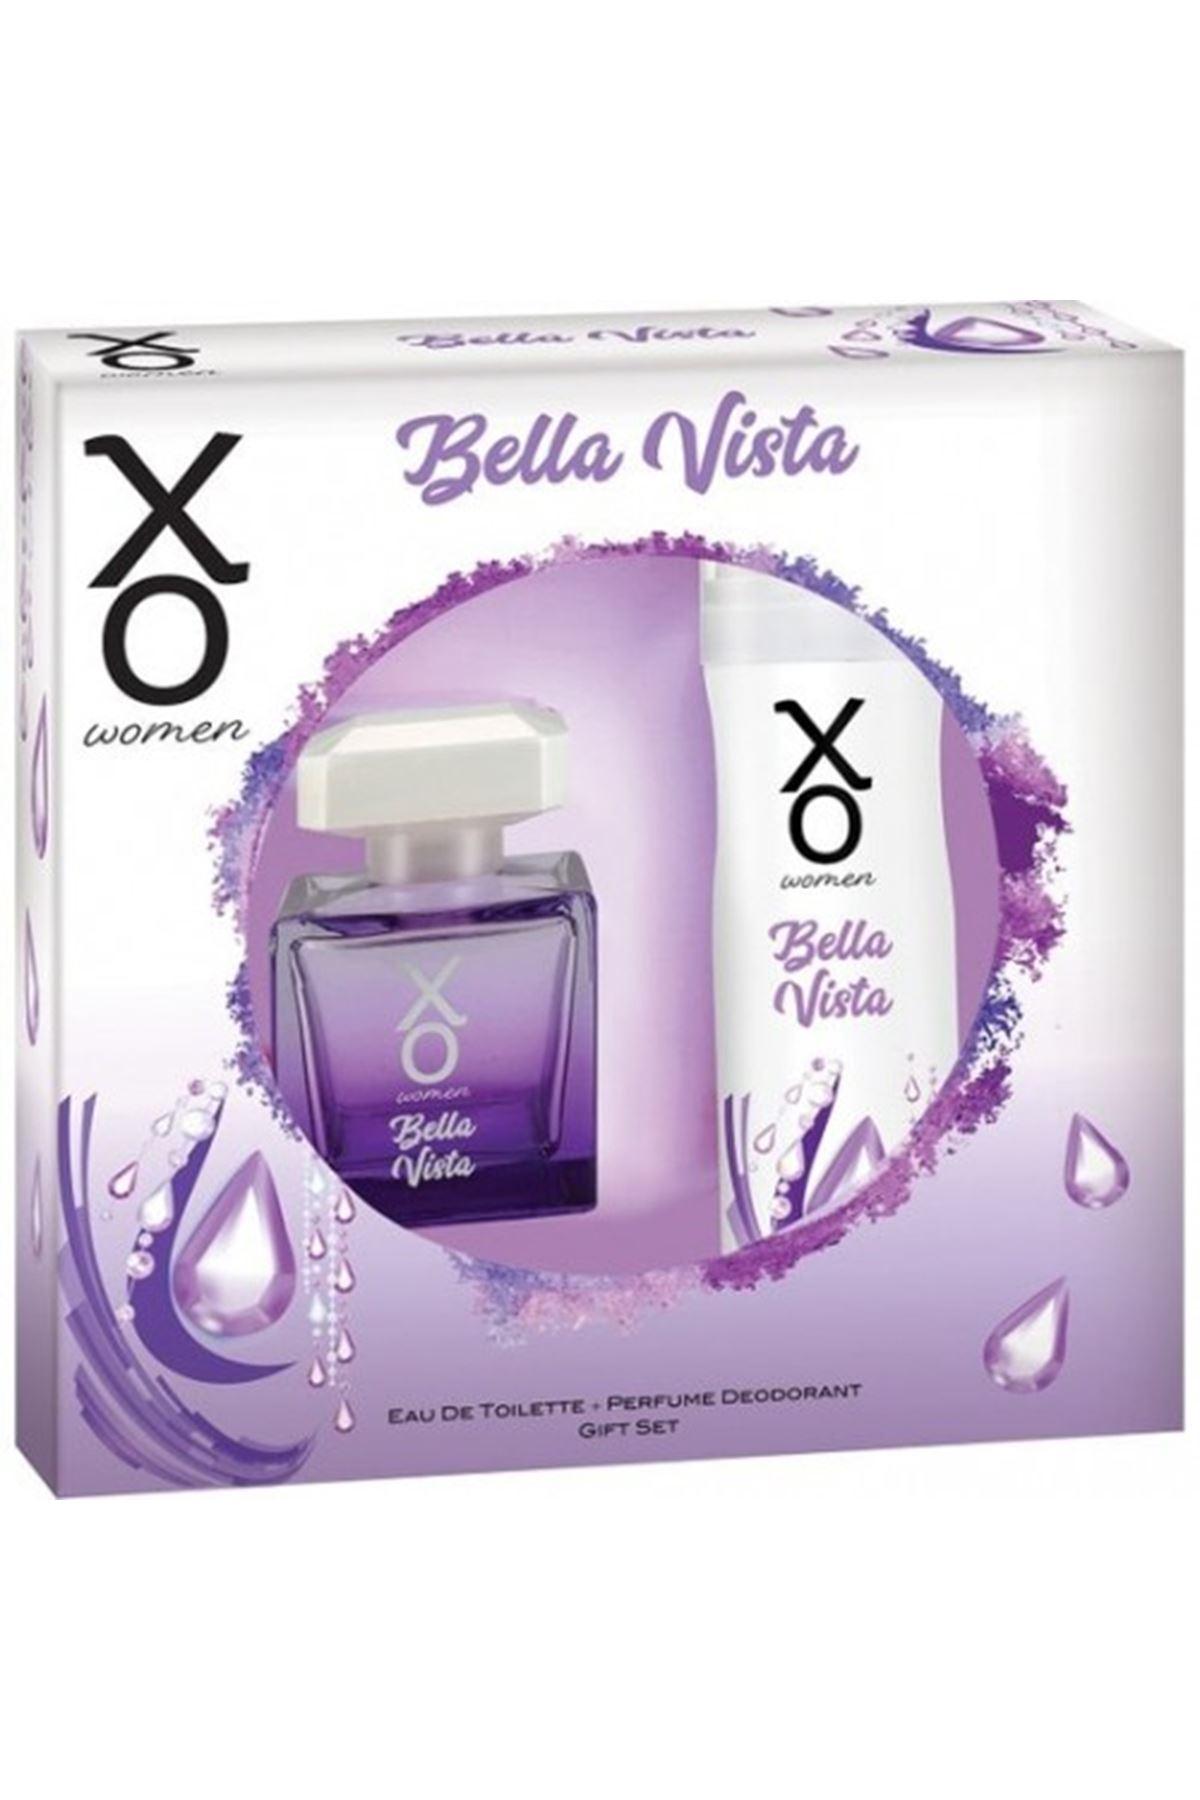 XO Kadın Parfüm Bella Vista 100ml Edt+ 125 ml Deodorant